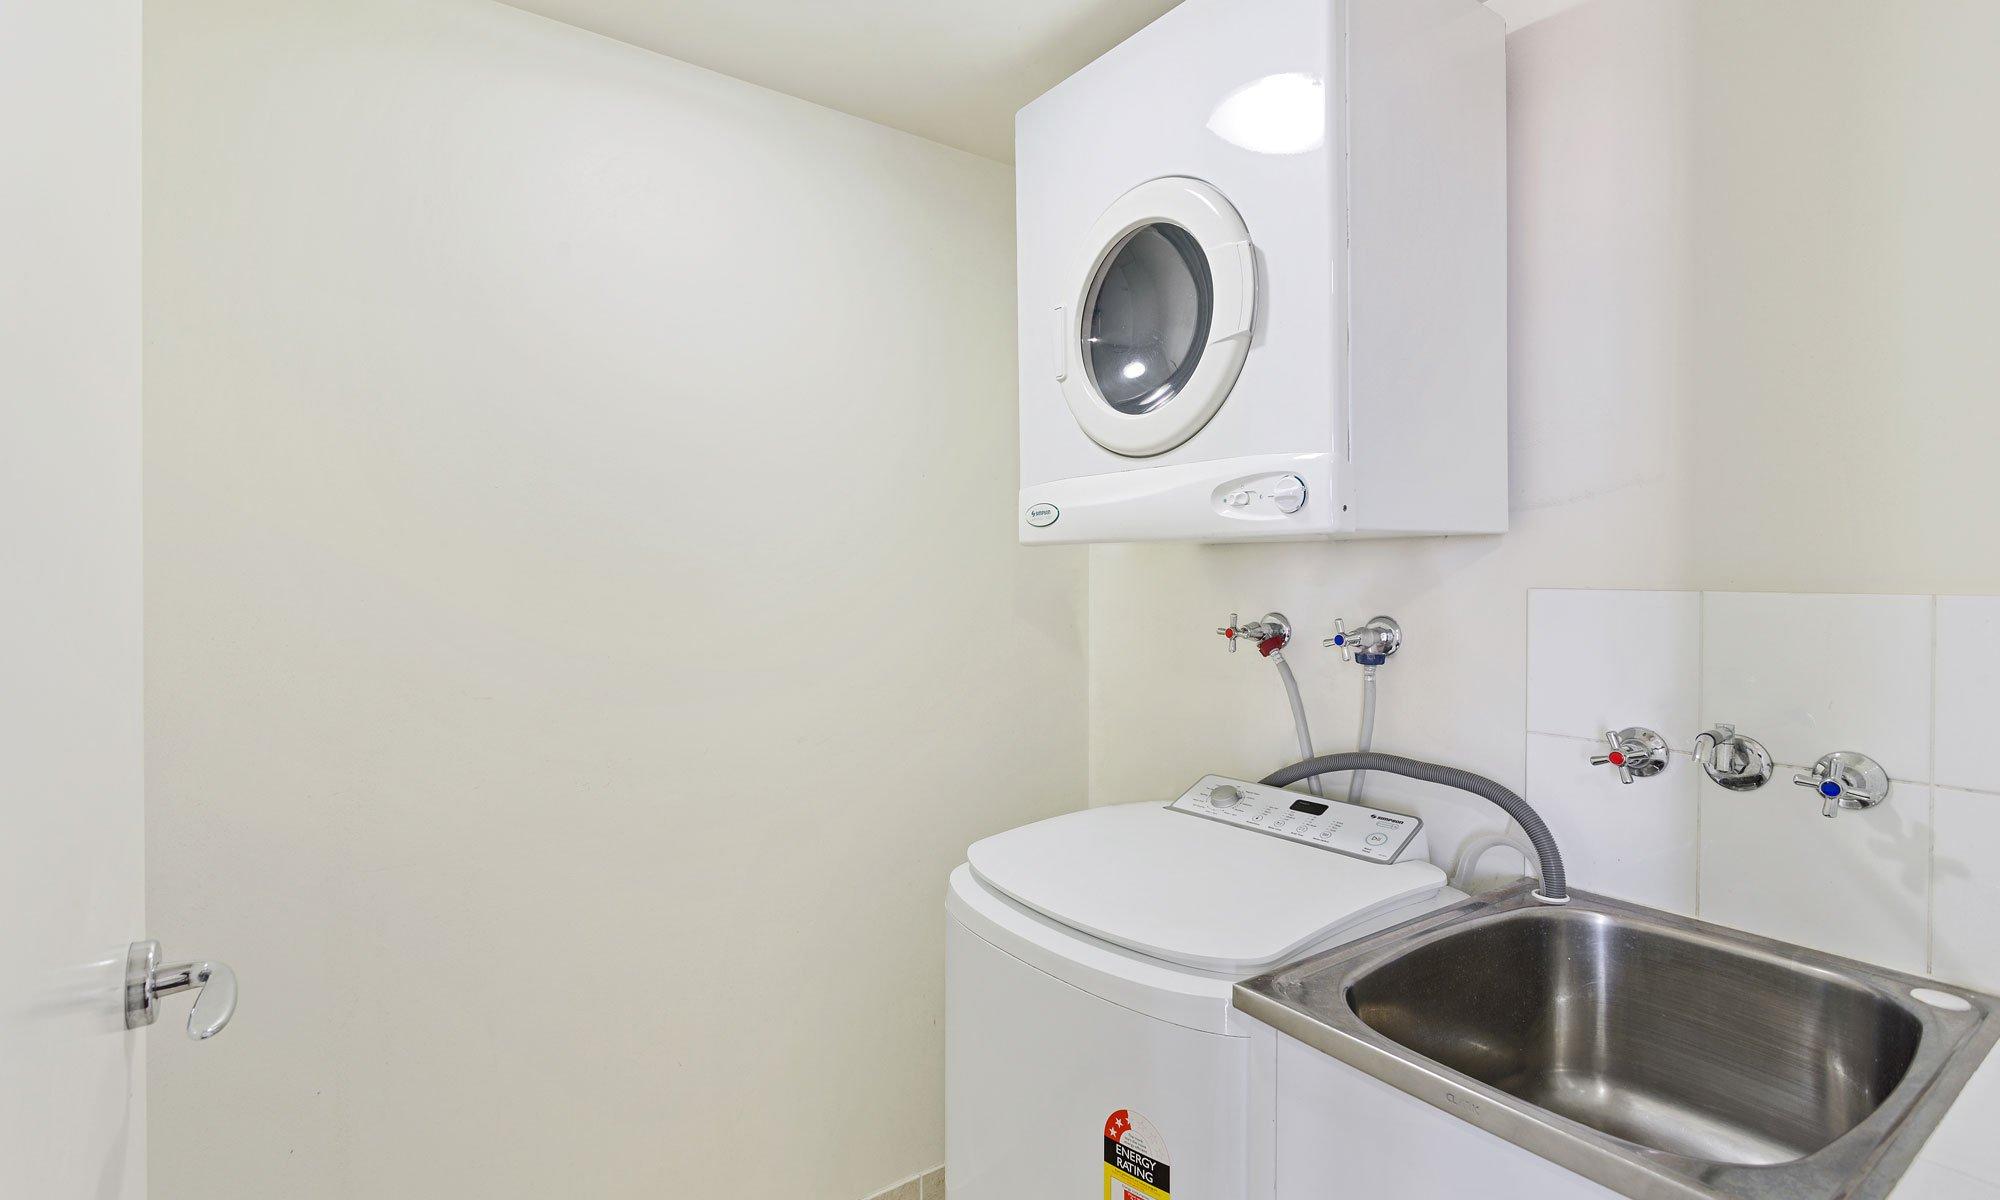 Gold Coast real estate for sale Chevron Renaissance 1171 large laundry room